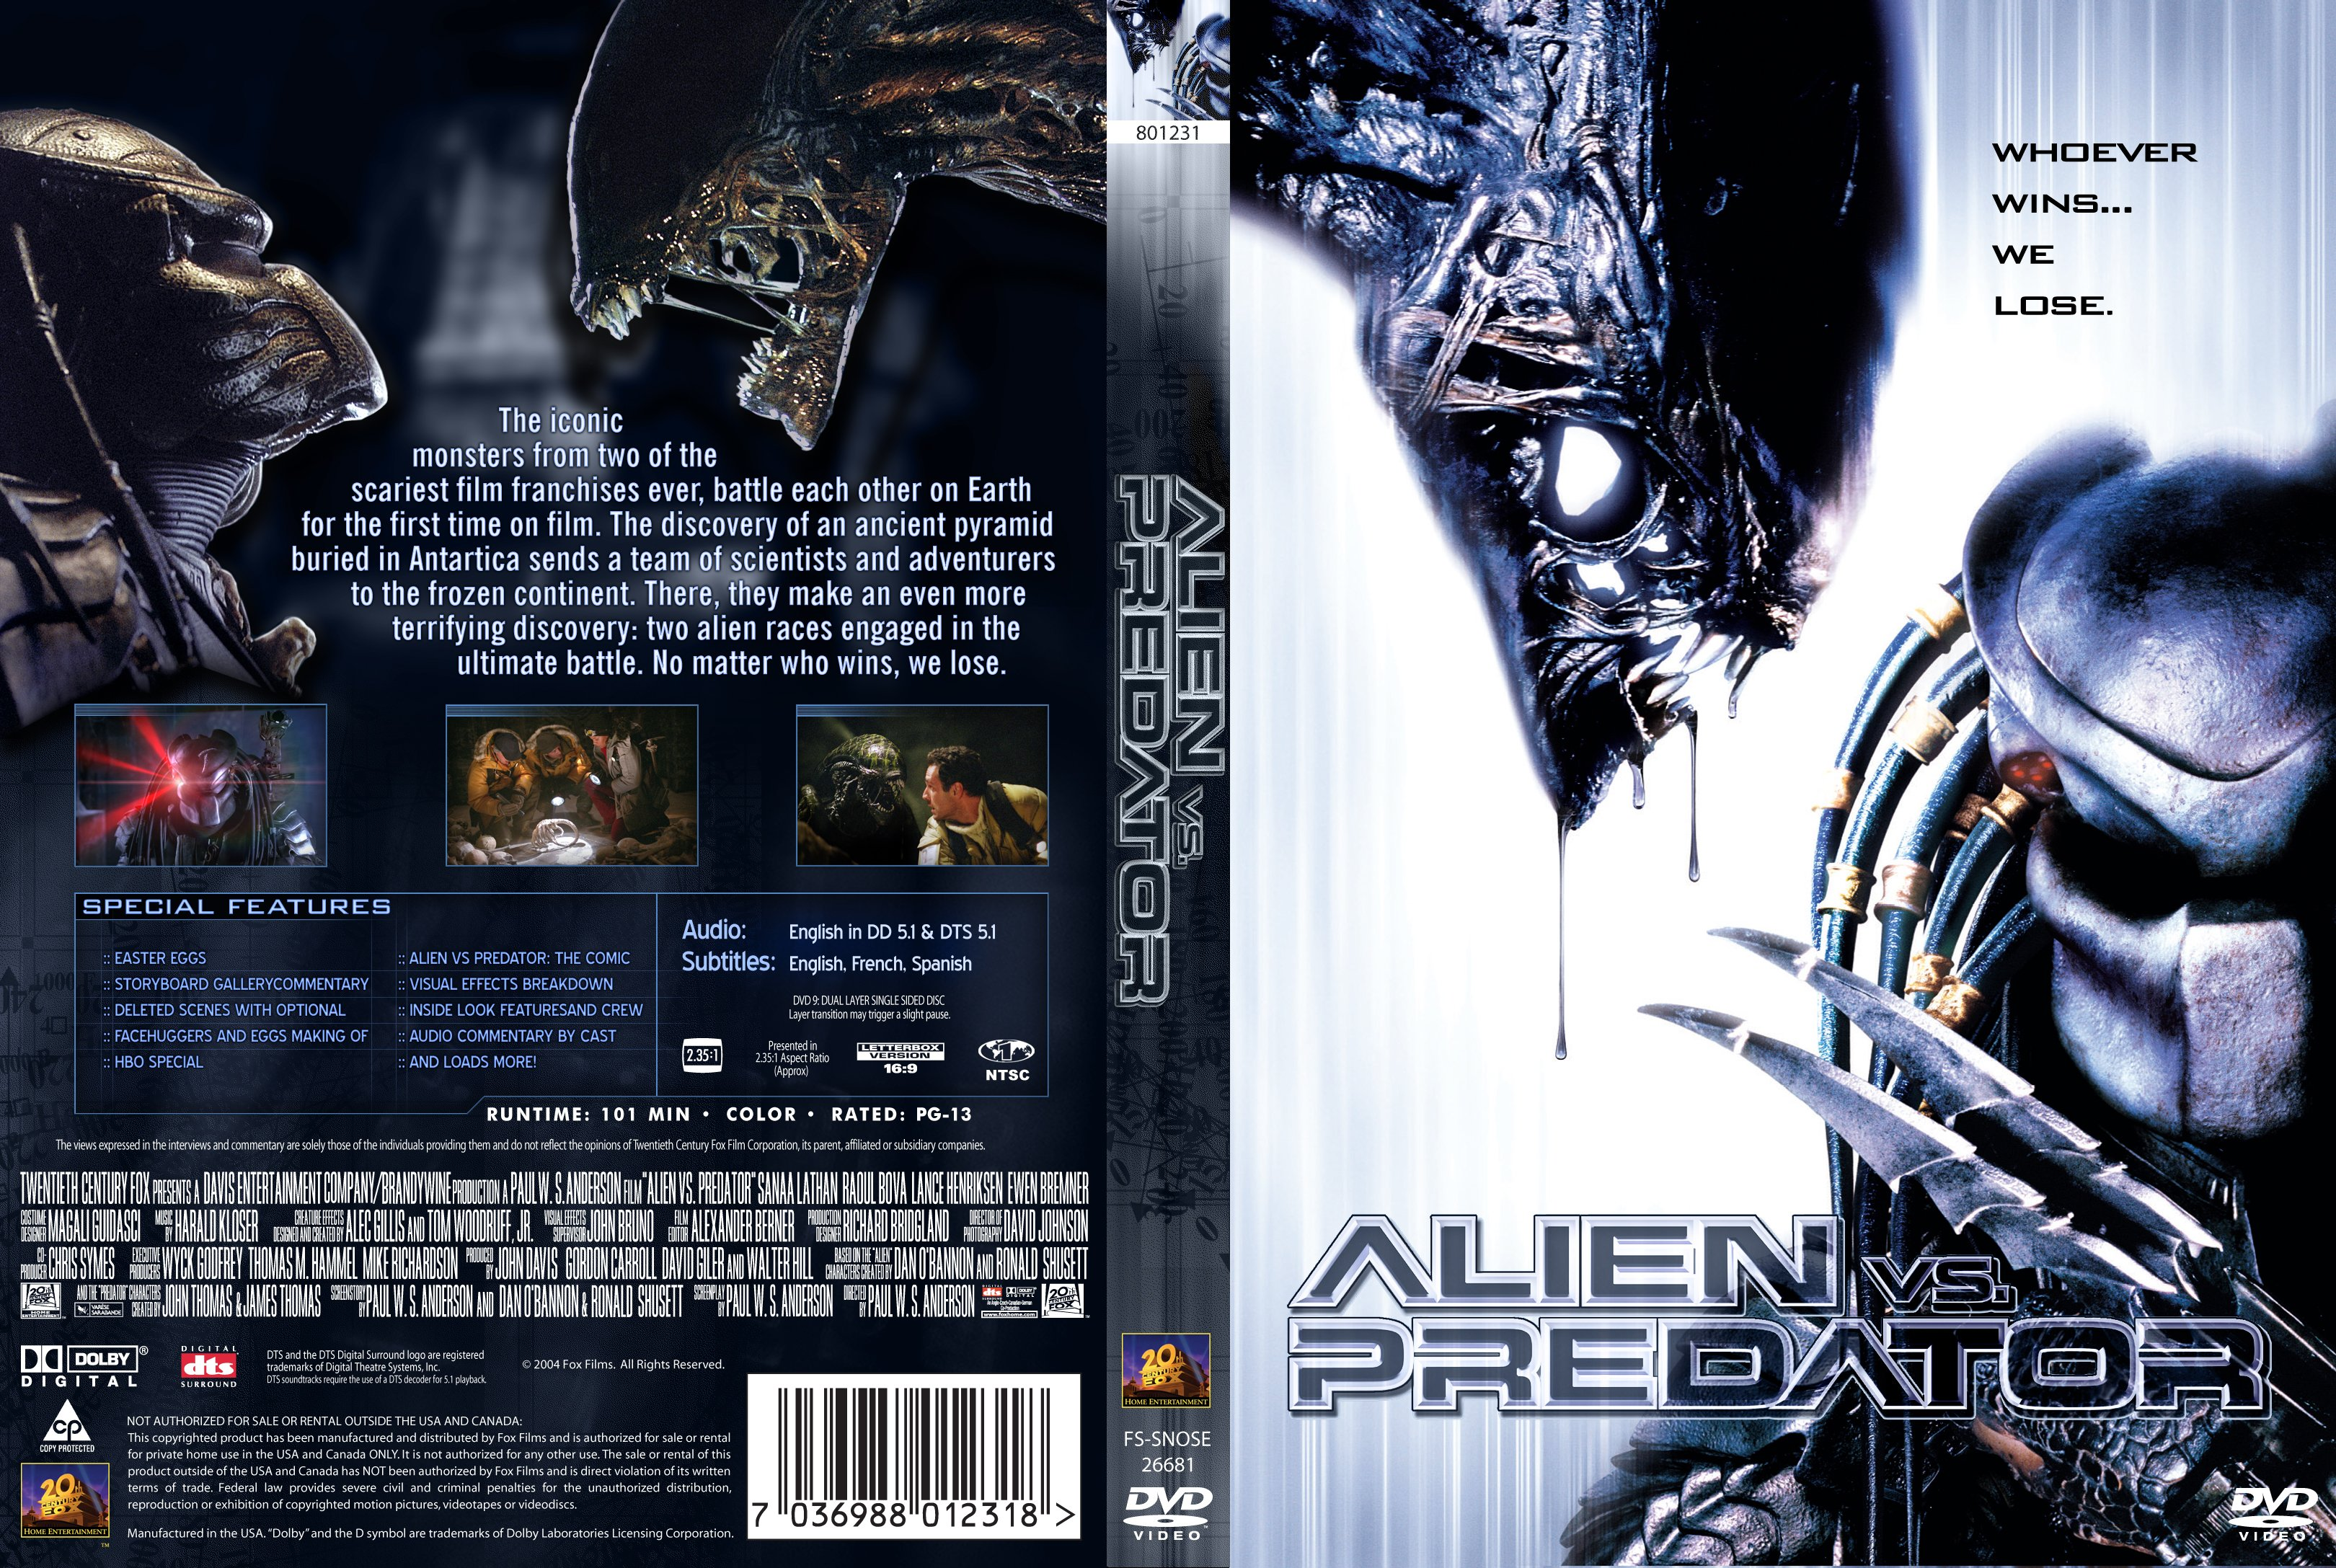 Movie Poster the hunt for red october movie poster : Alien Vs Predator Dvd Cover : Car Interior Design